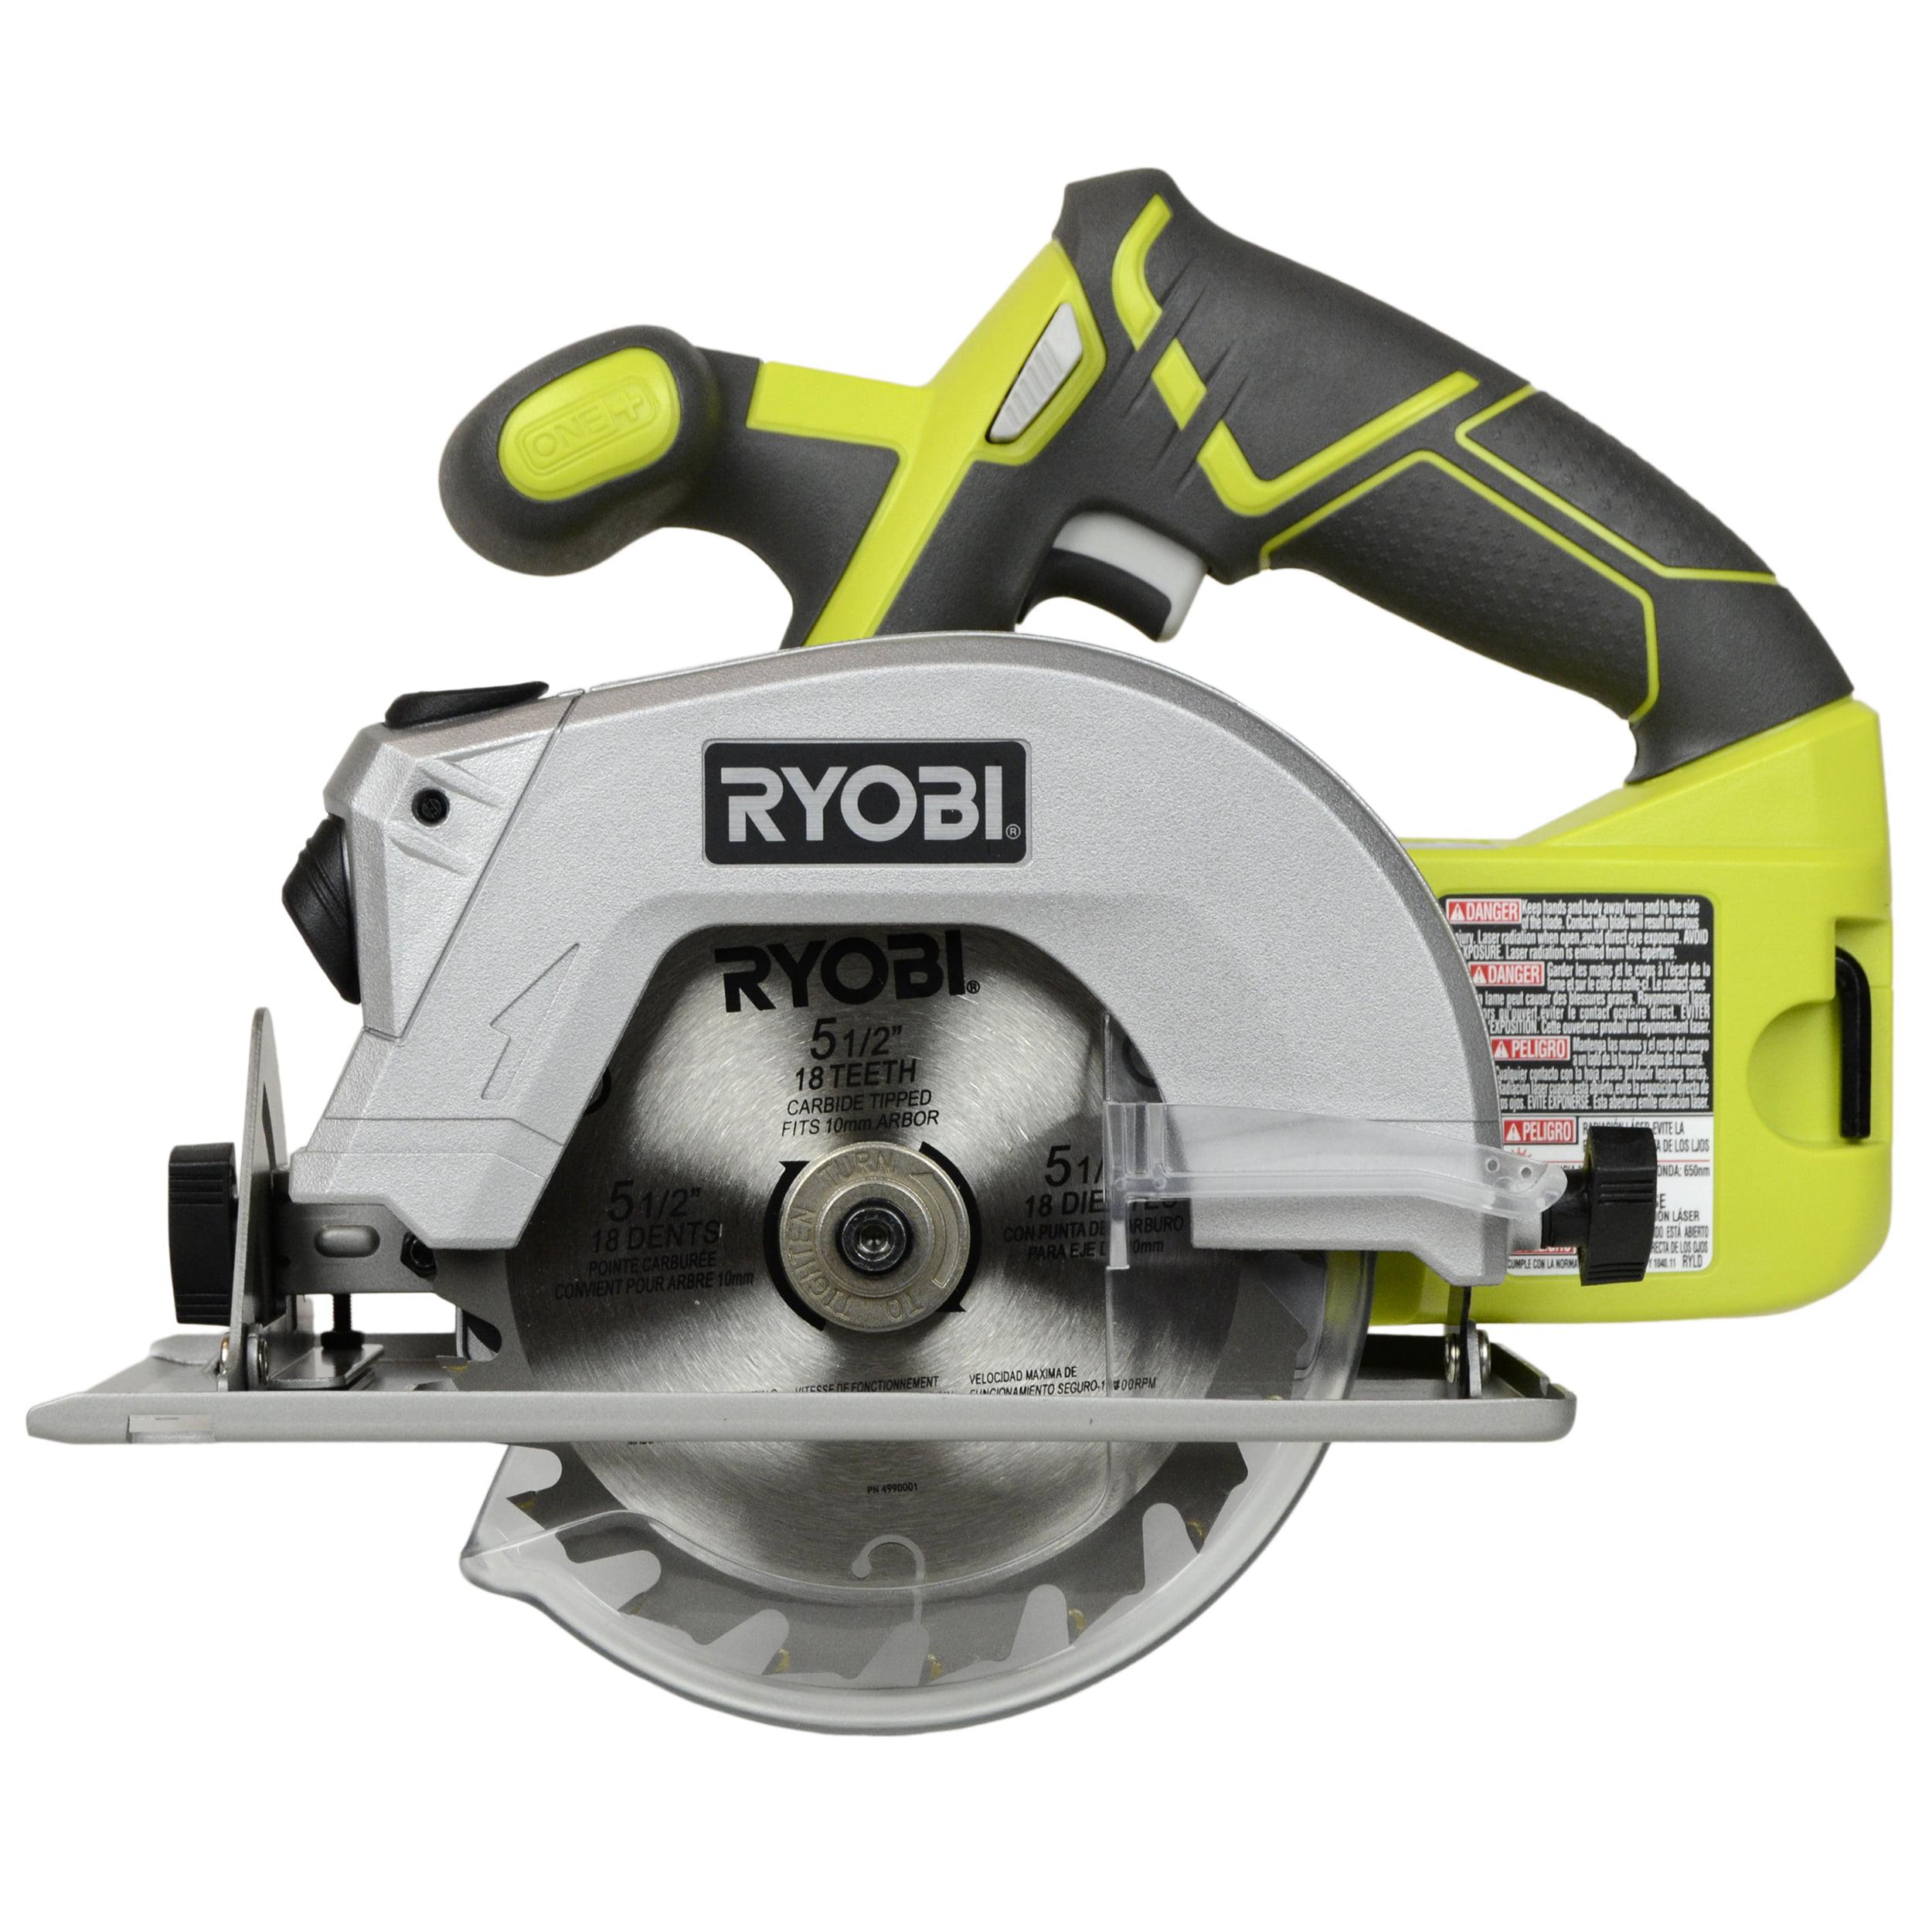 "Ryobi Tools P506 18V ONE+ Lithium-ion 5-1/2"" Cordless Circular Saw, Tool Only"